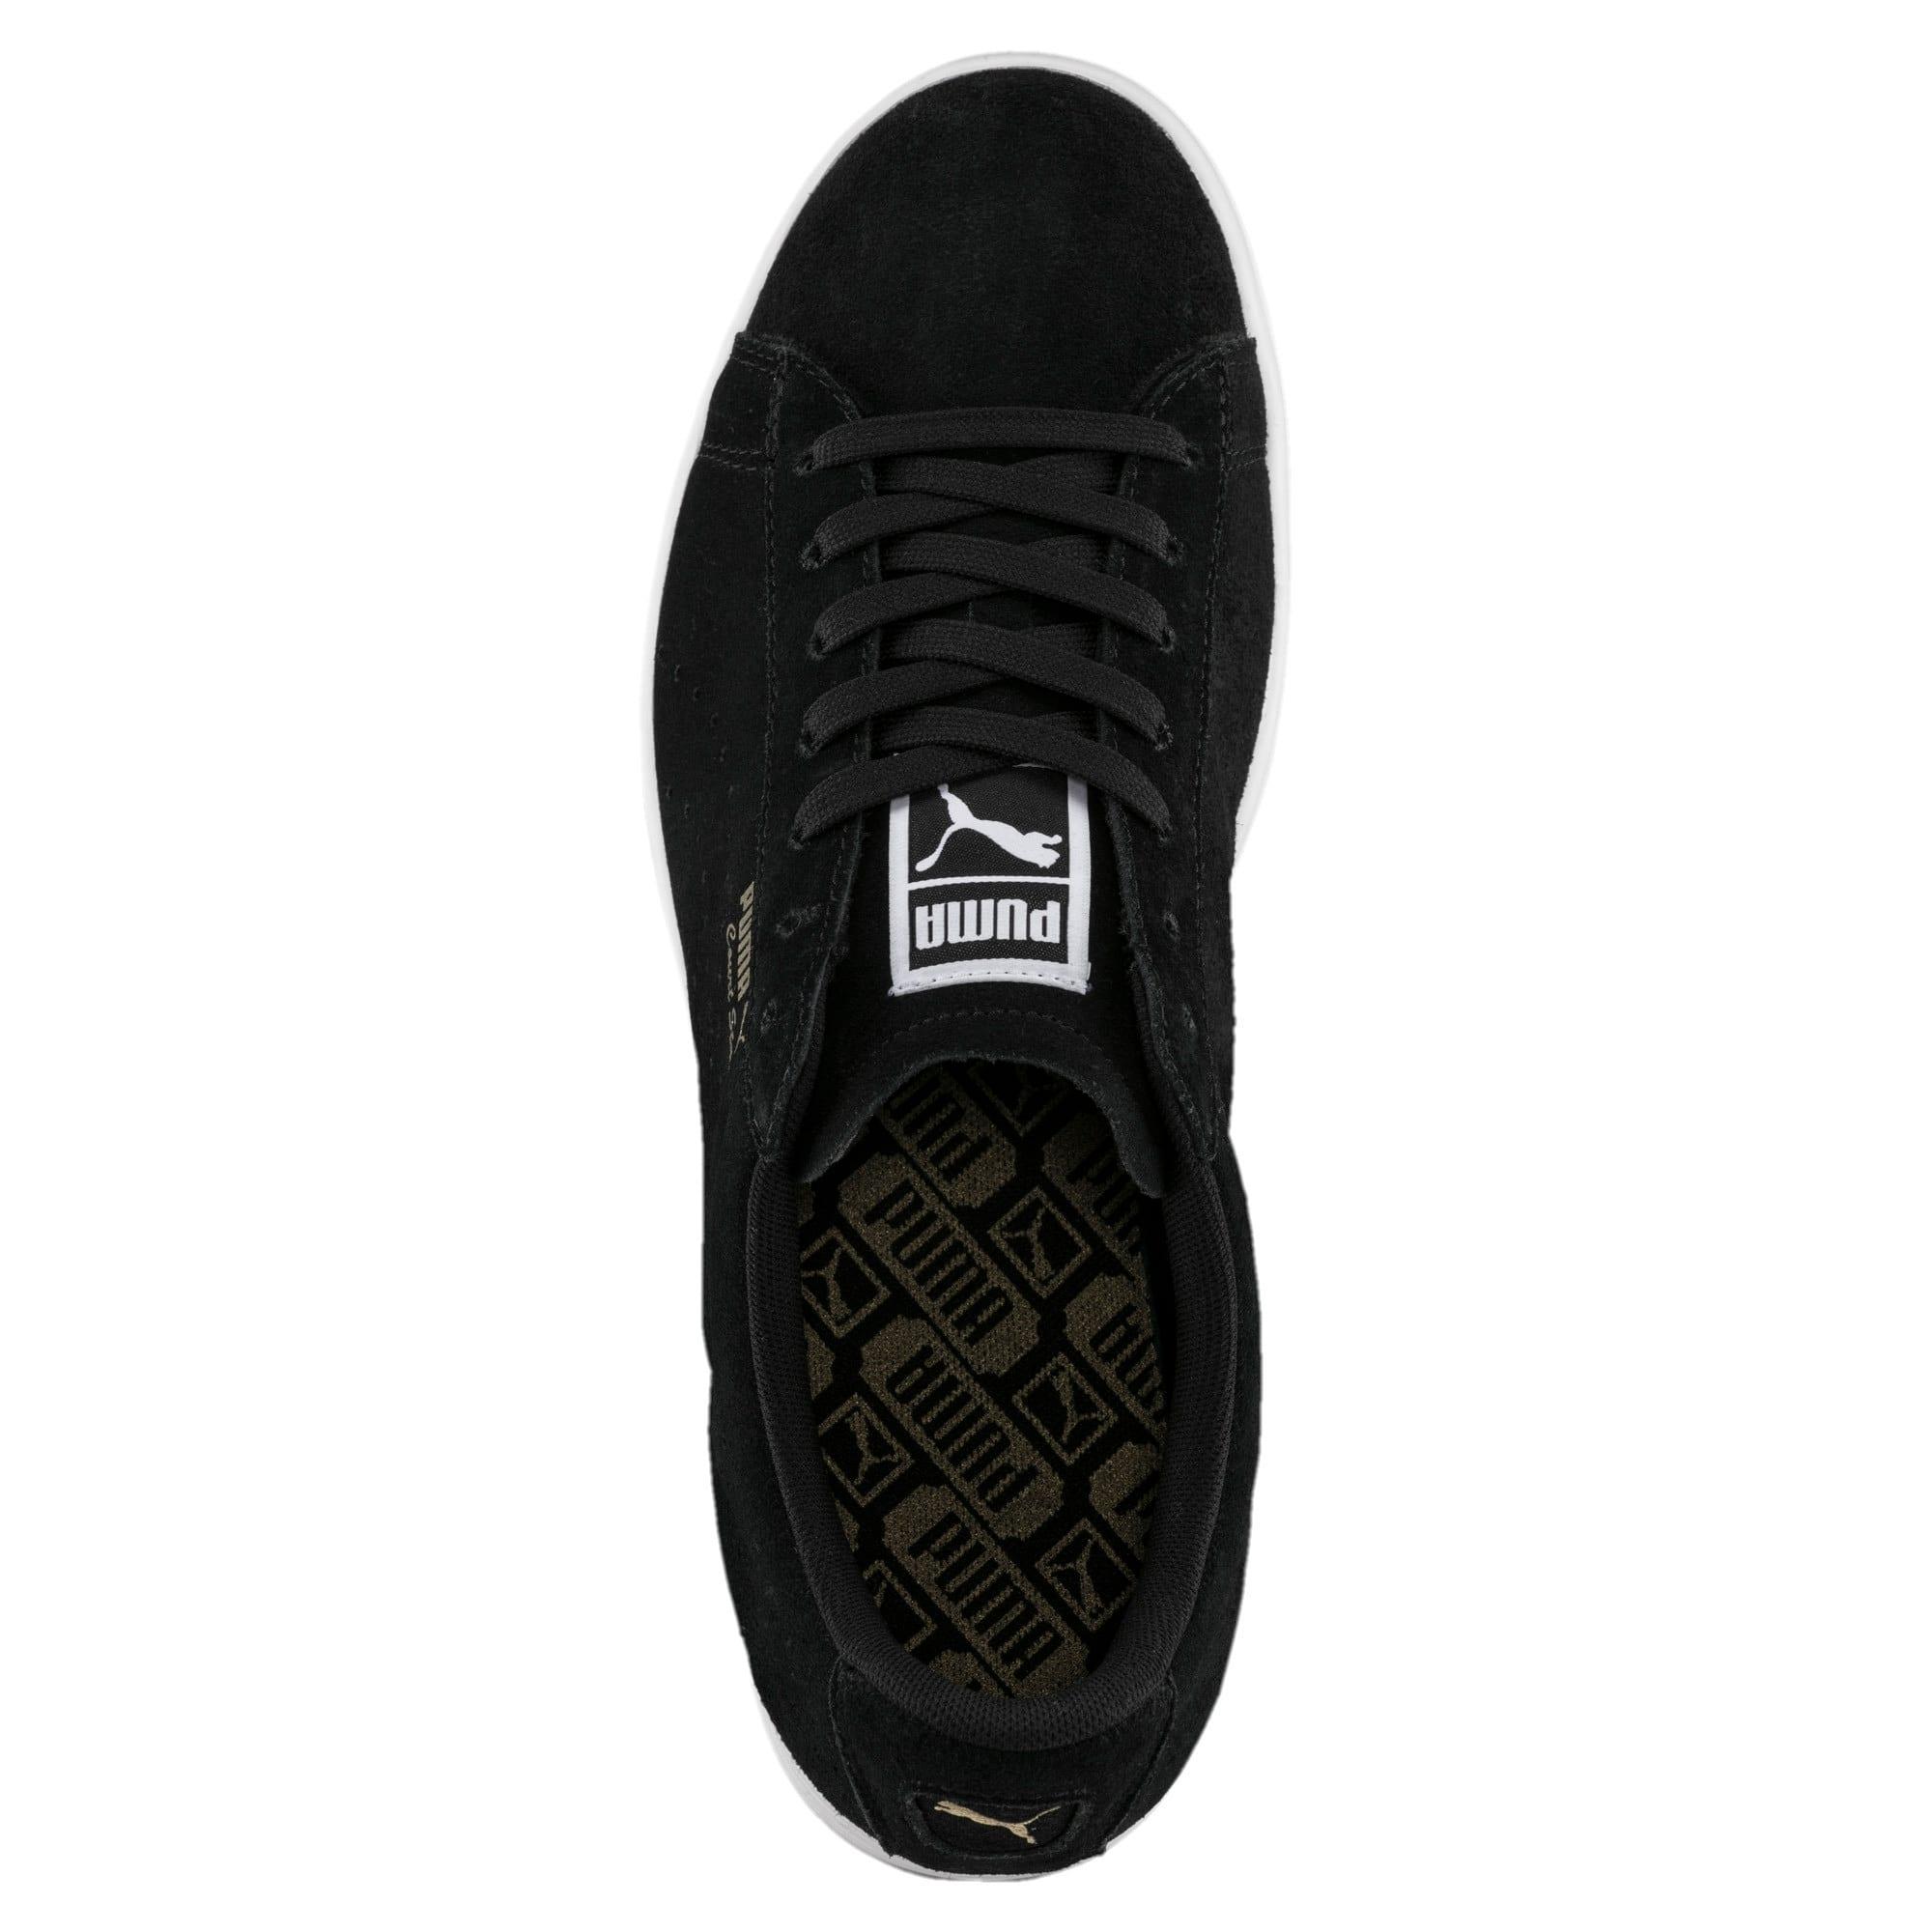 Thumbnail 5 of Court Star Suede Sneakers, Puma Black, medium